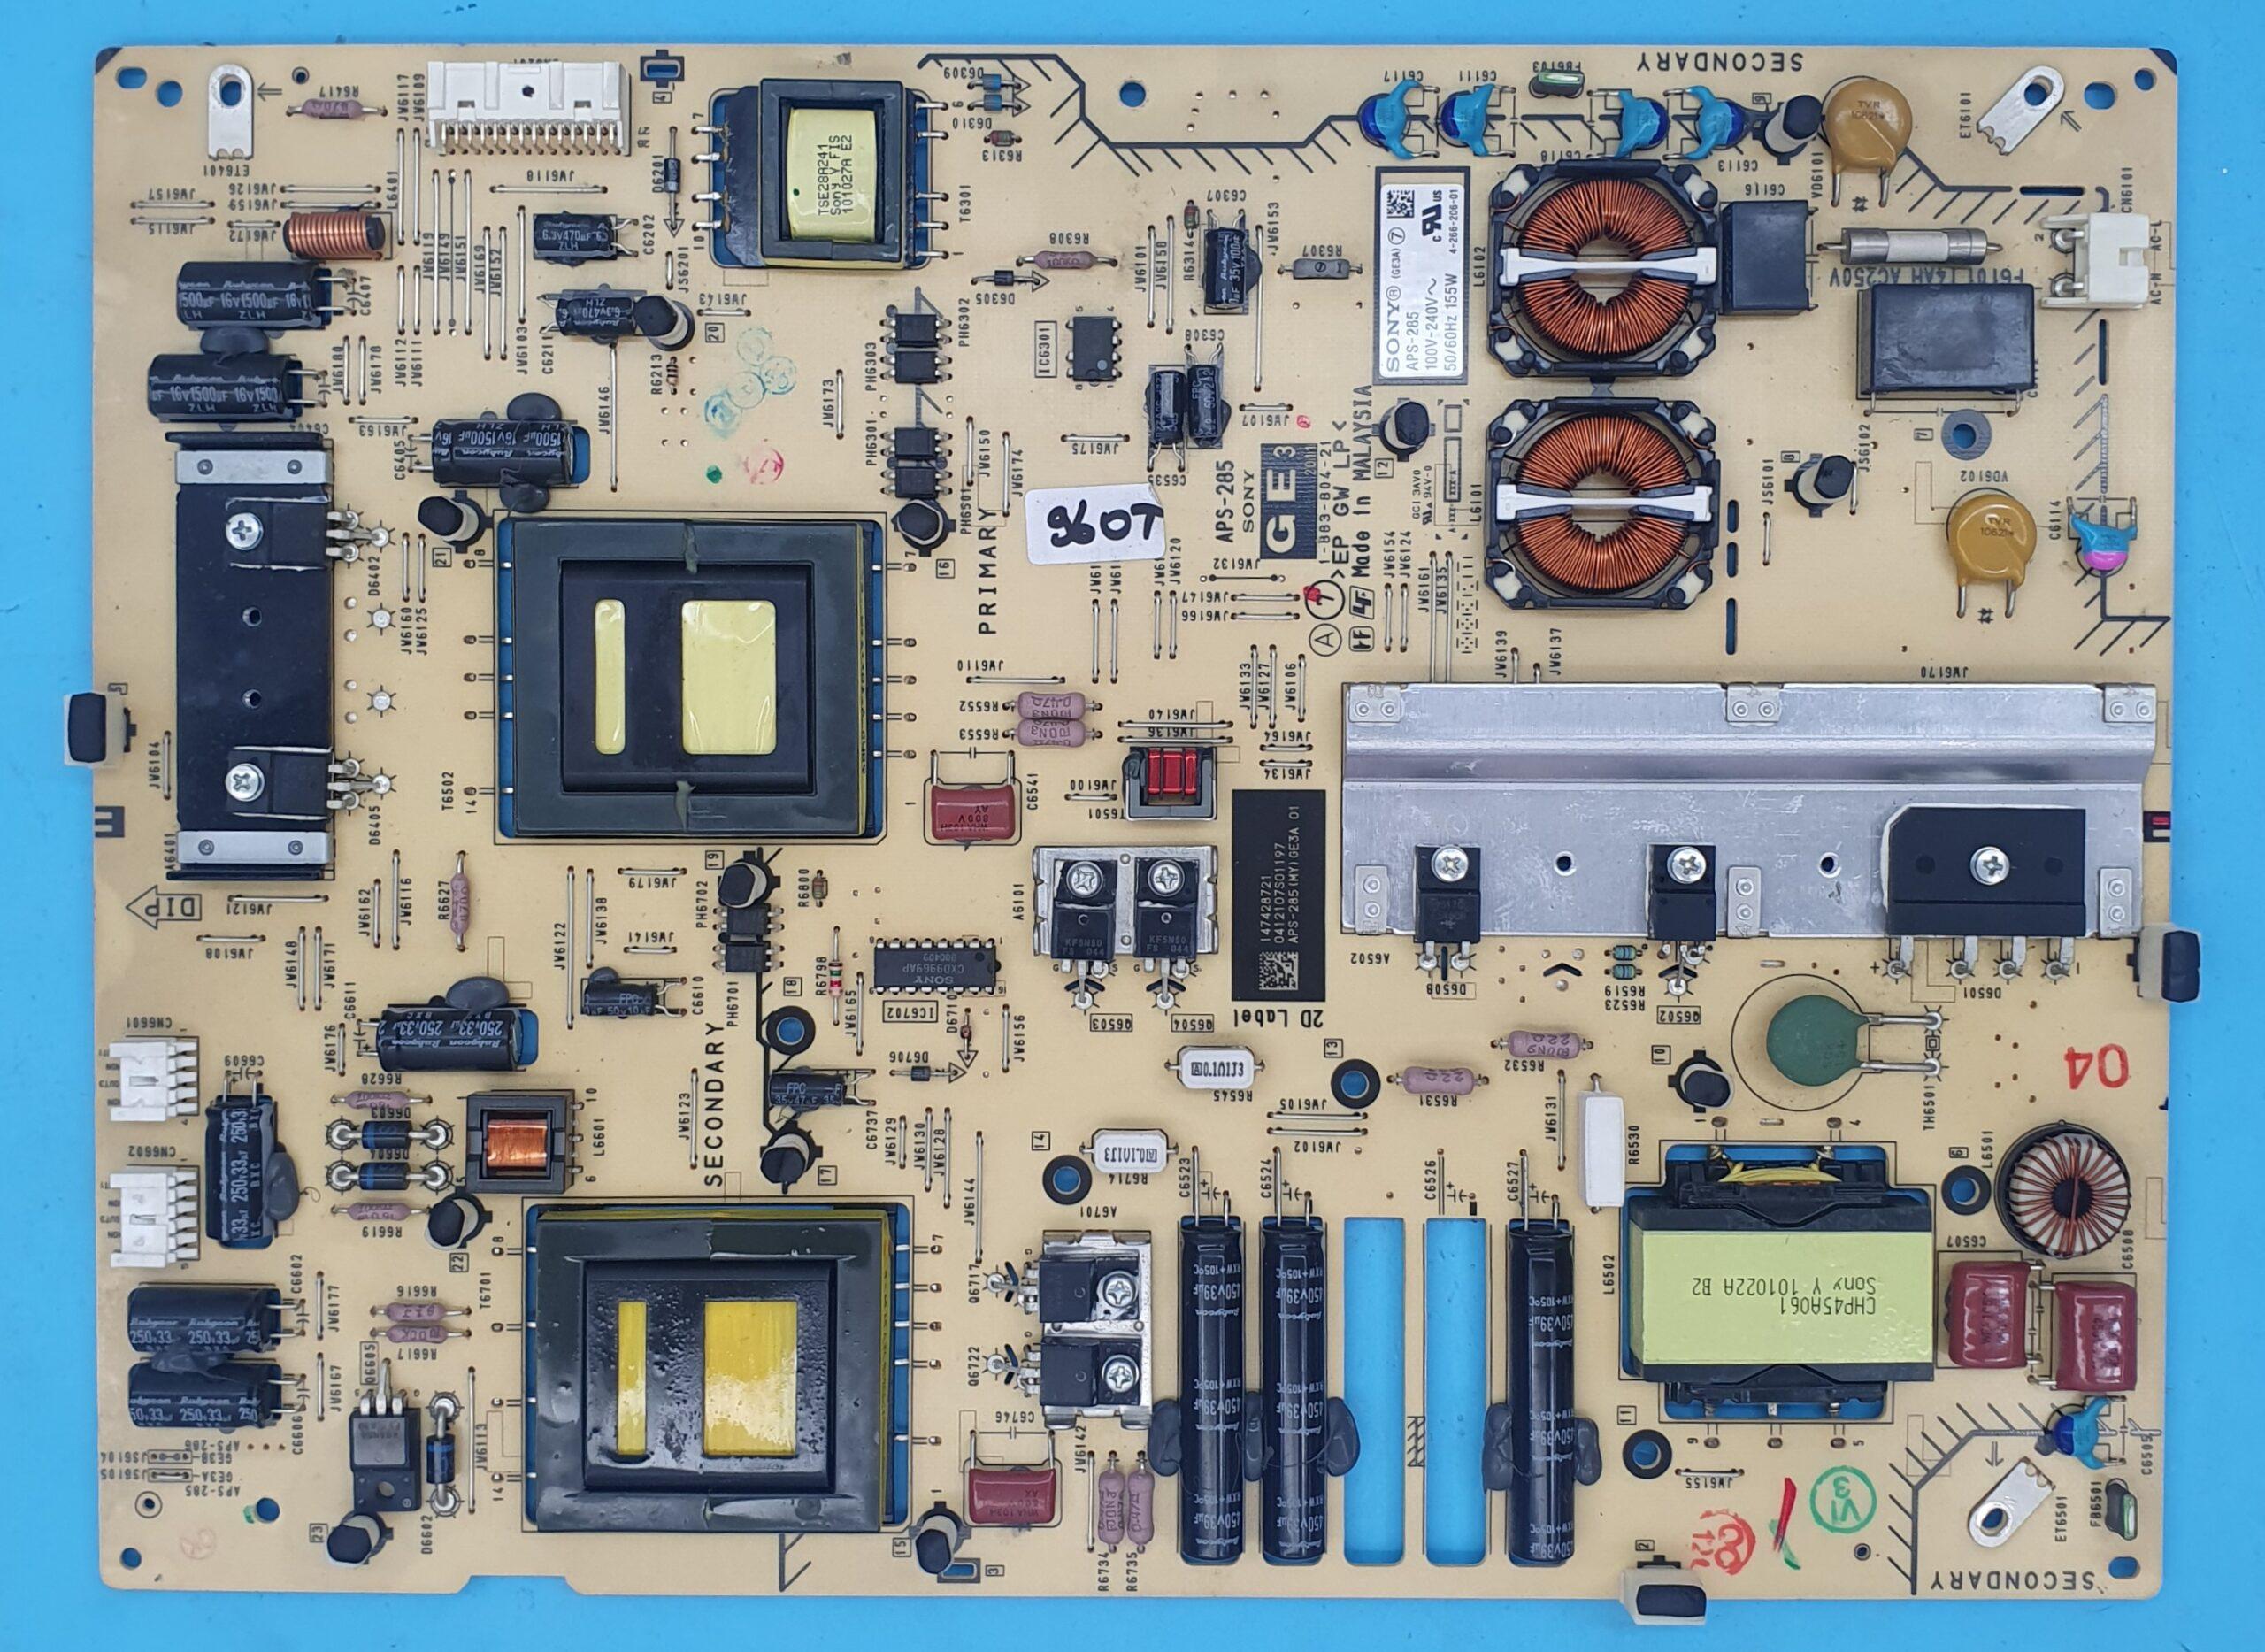 1-883-804-21,APS-285 SONY Power (KDV DAHİL = 236 TL)